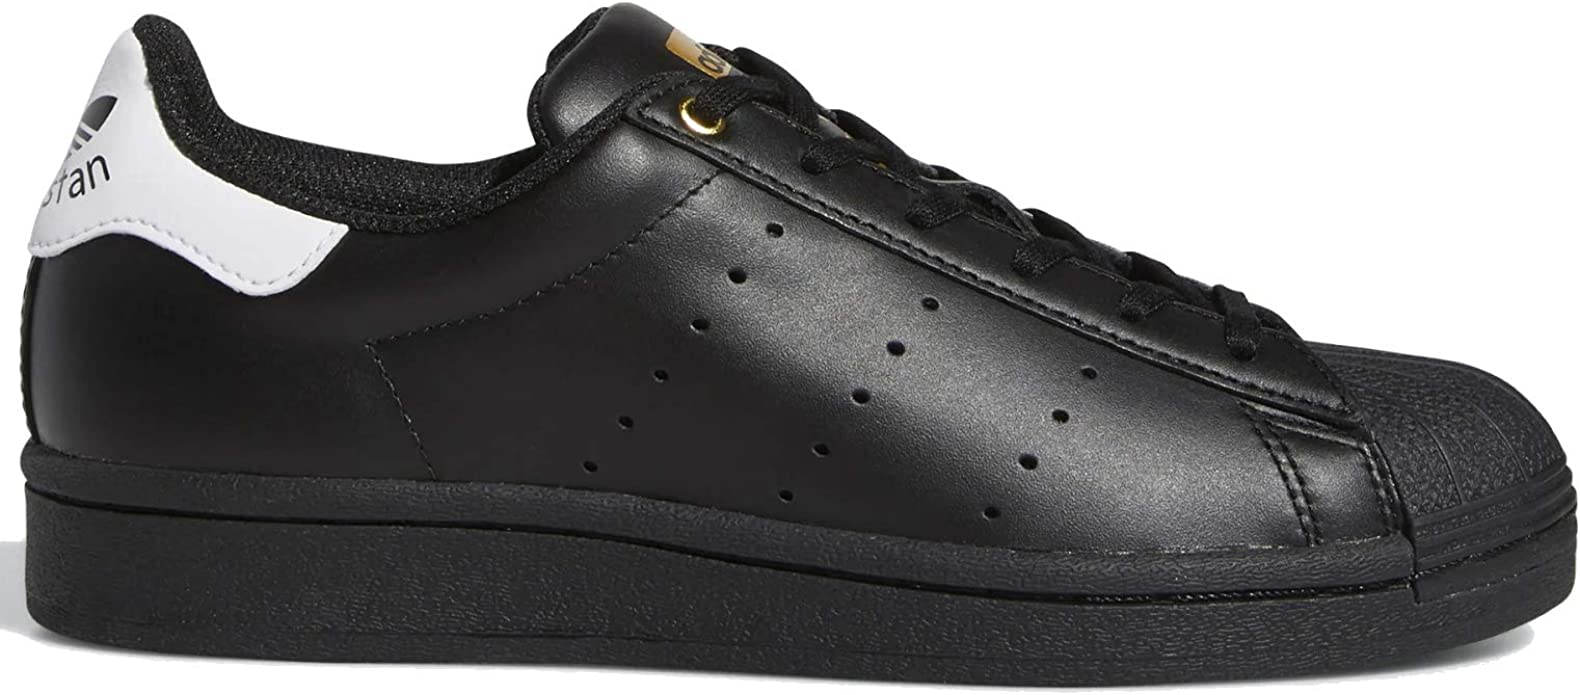 black and white shell toe adidas grade school